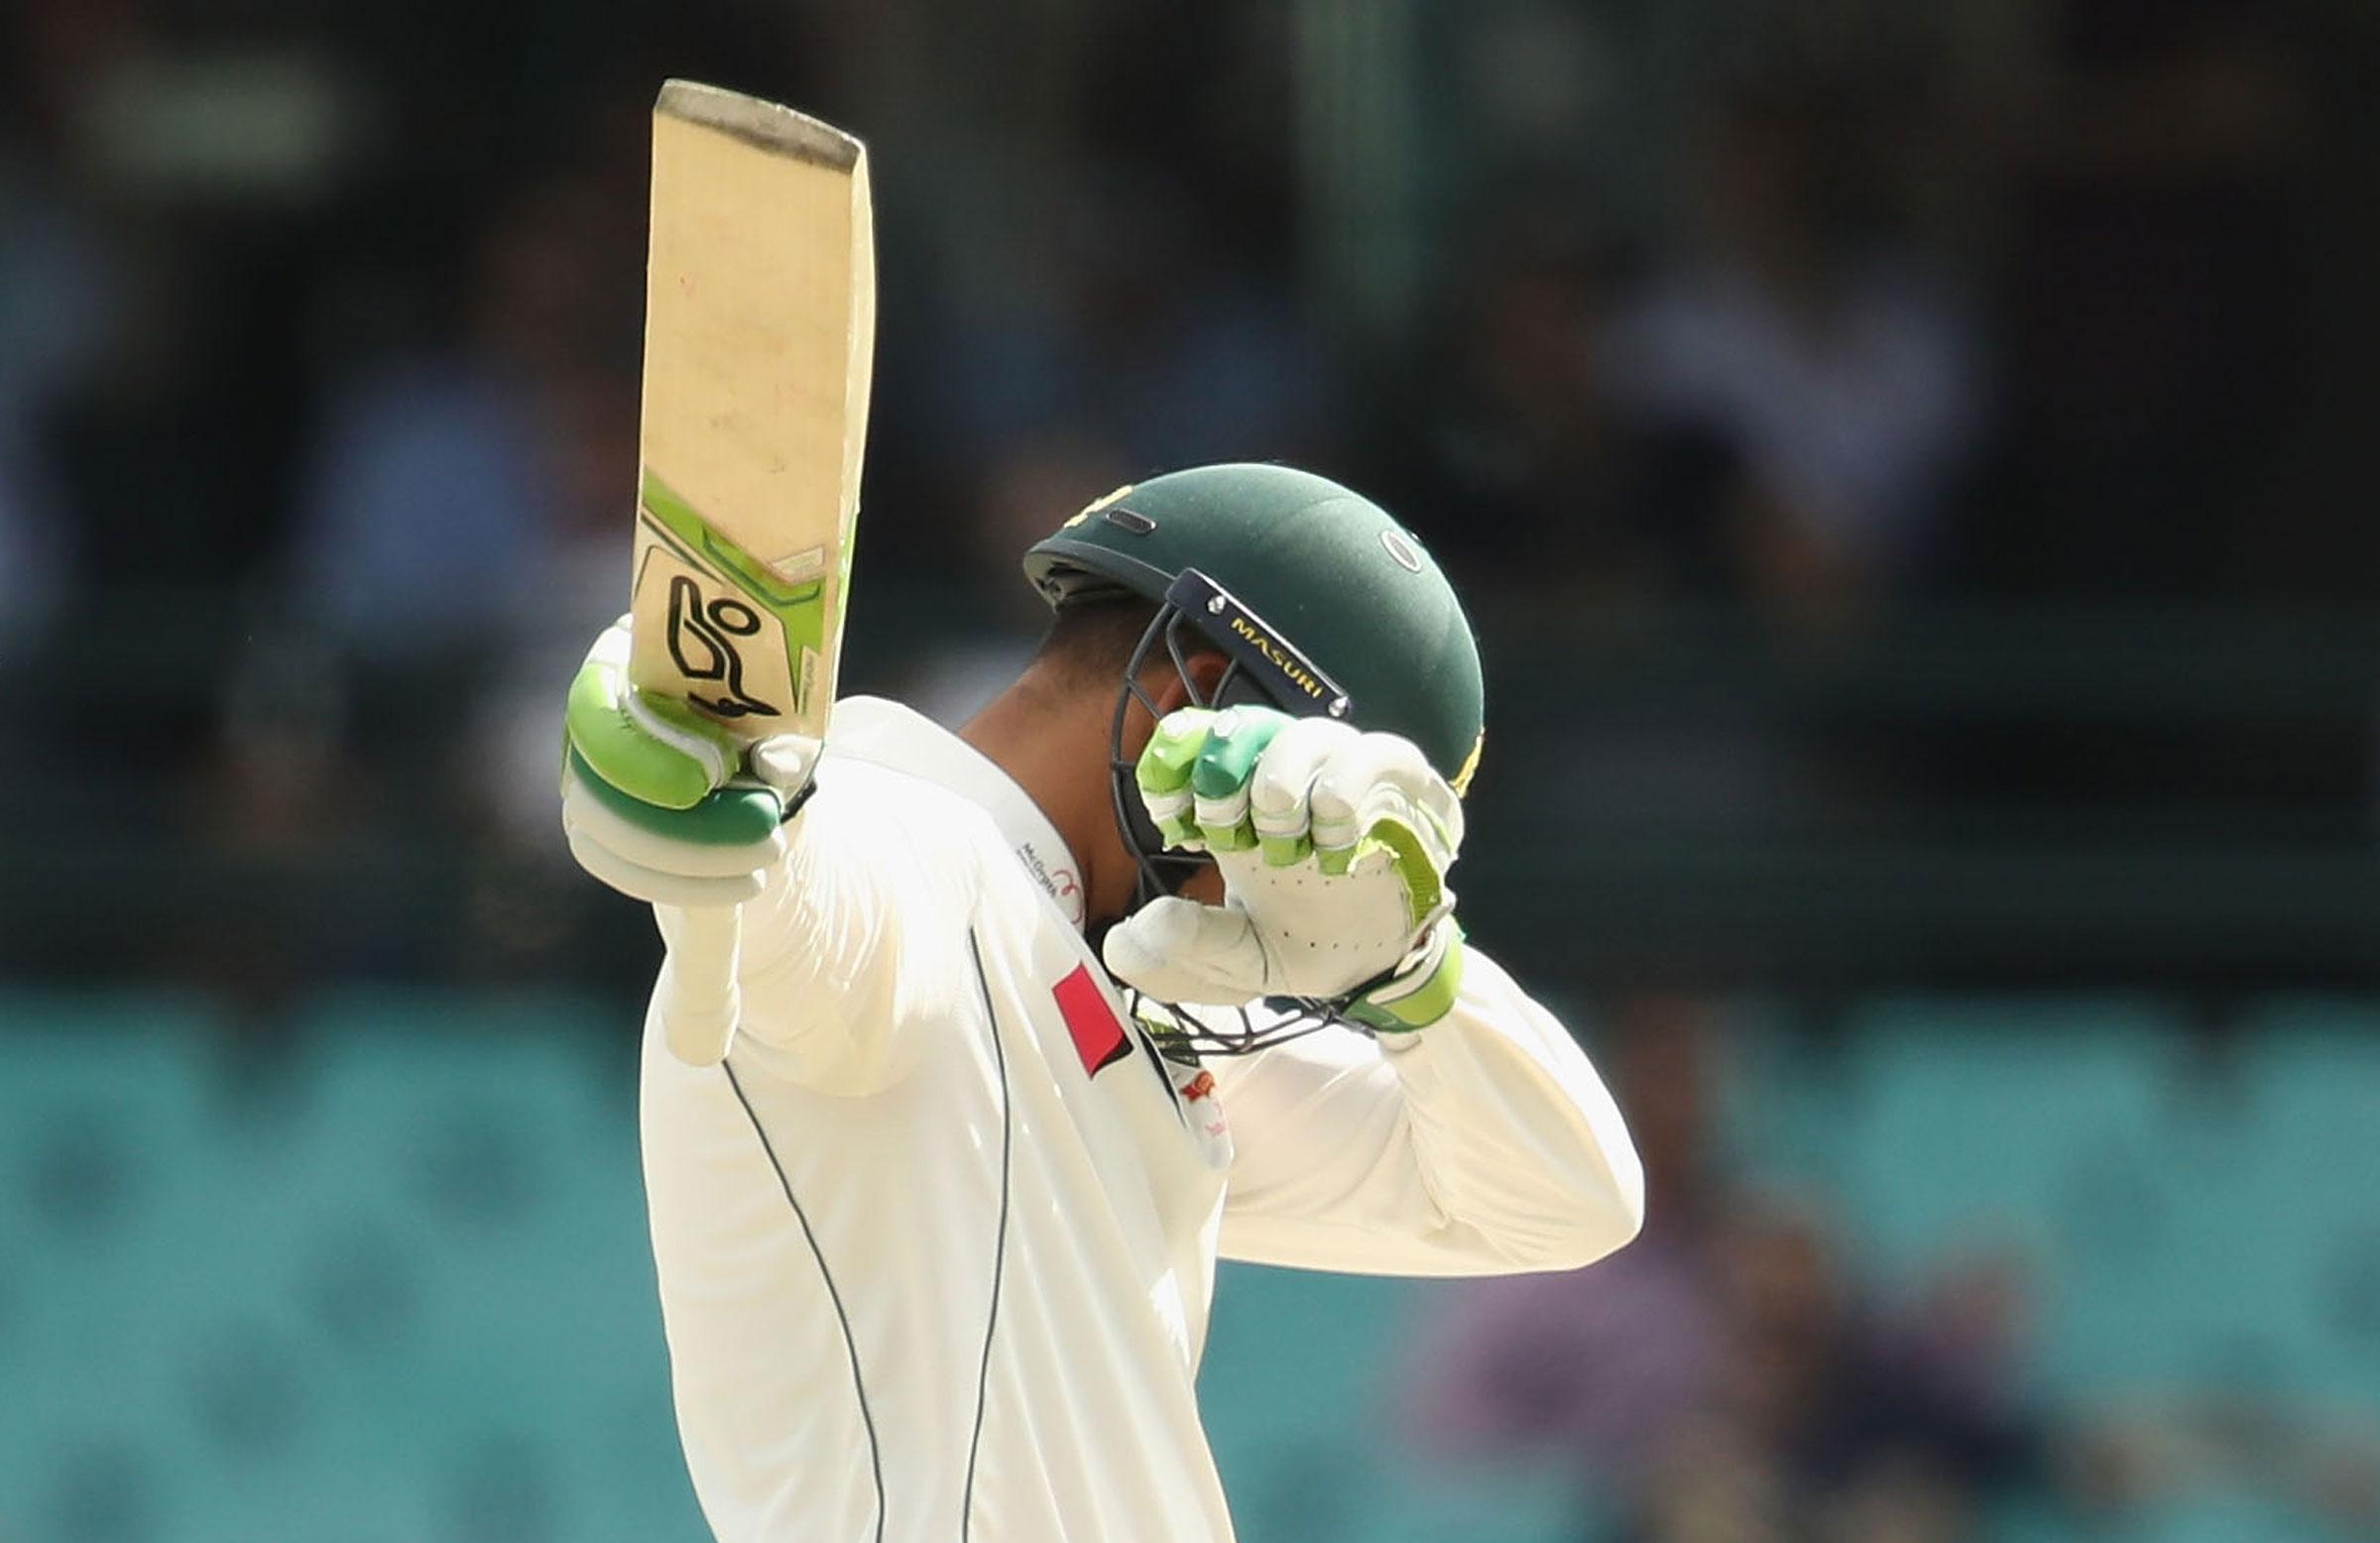 Khawaja's celebration ignites debate | cricket.com.au